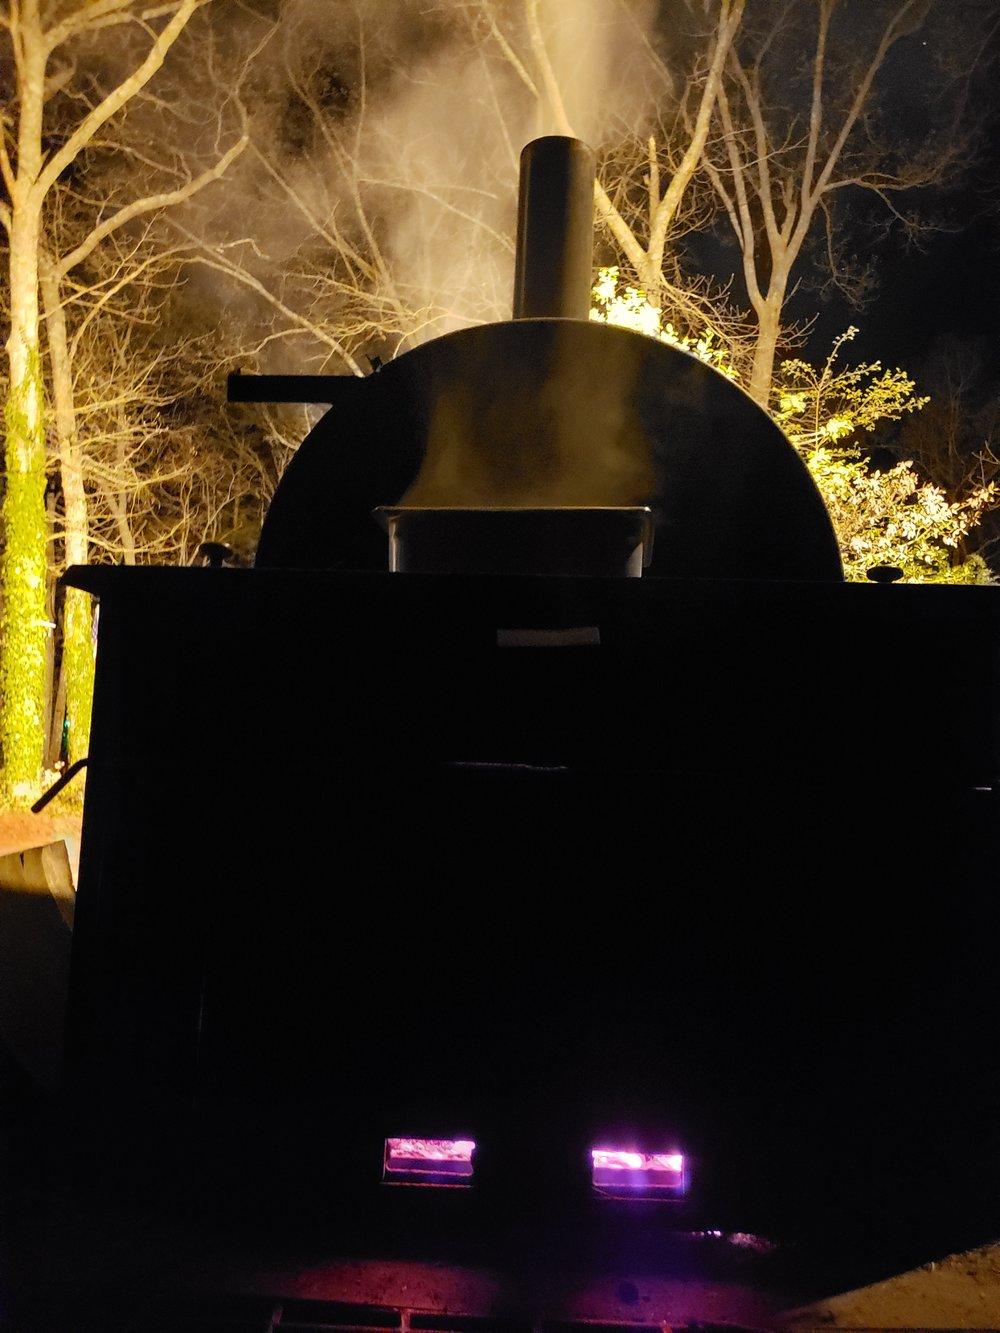 Up all night smoking pork butts